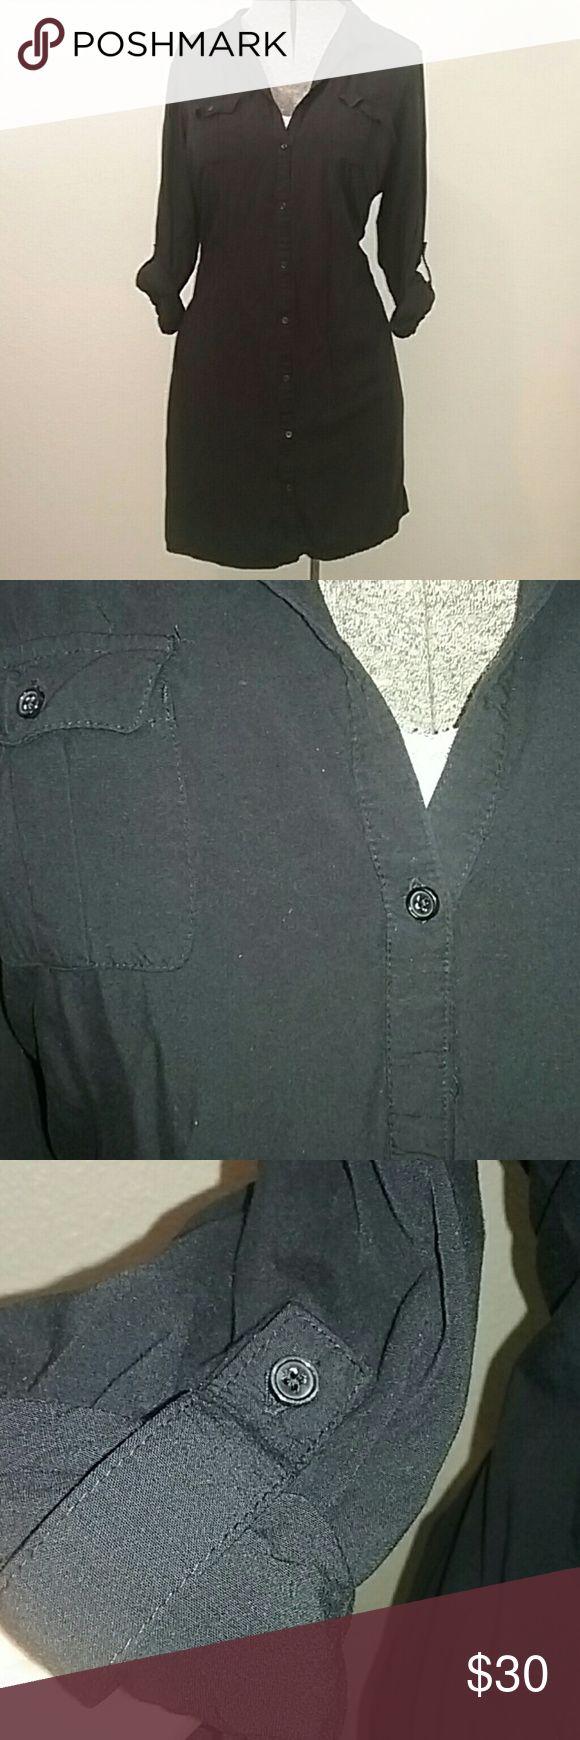 Black Safari Dress Black button front safari style tee shirt dress with 2 chest pockets. Old Navy Dresses